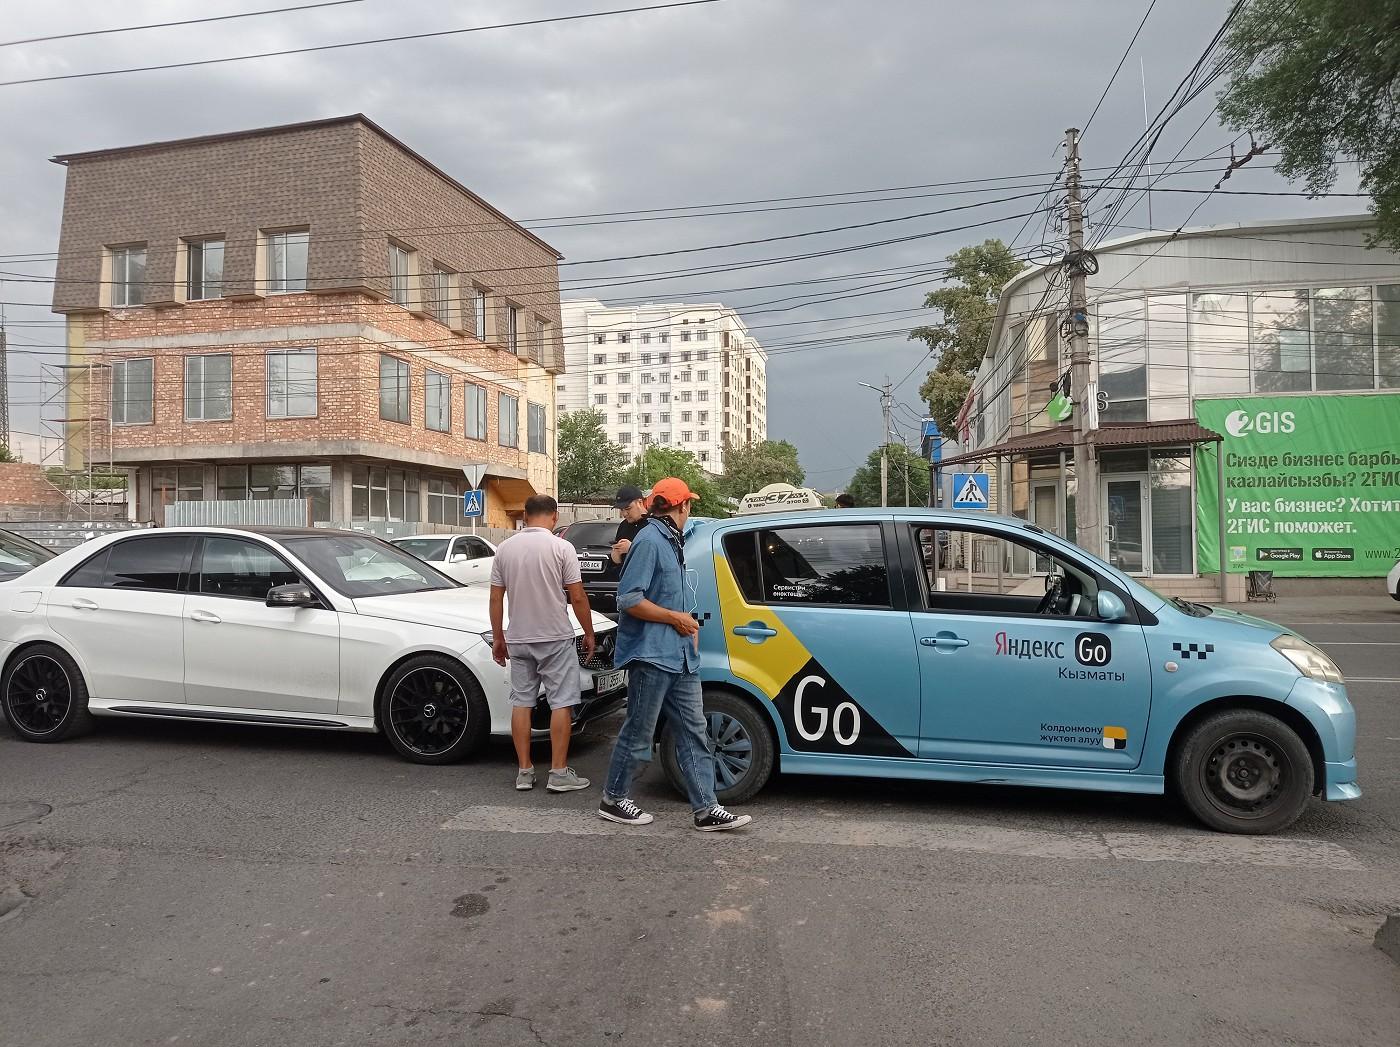 Yandex taxi car crash Bishkek Kyrgyzstan